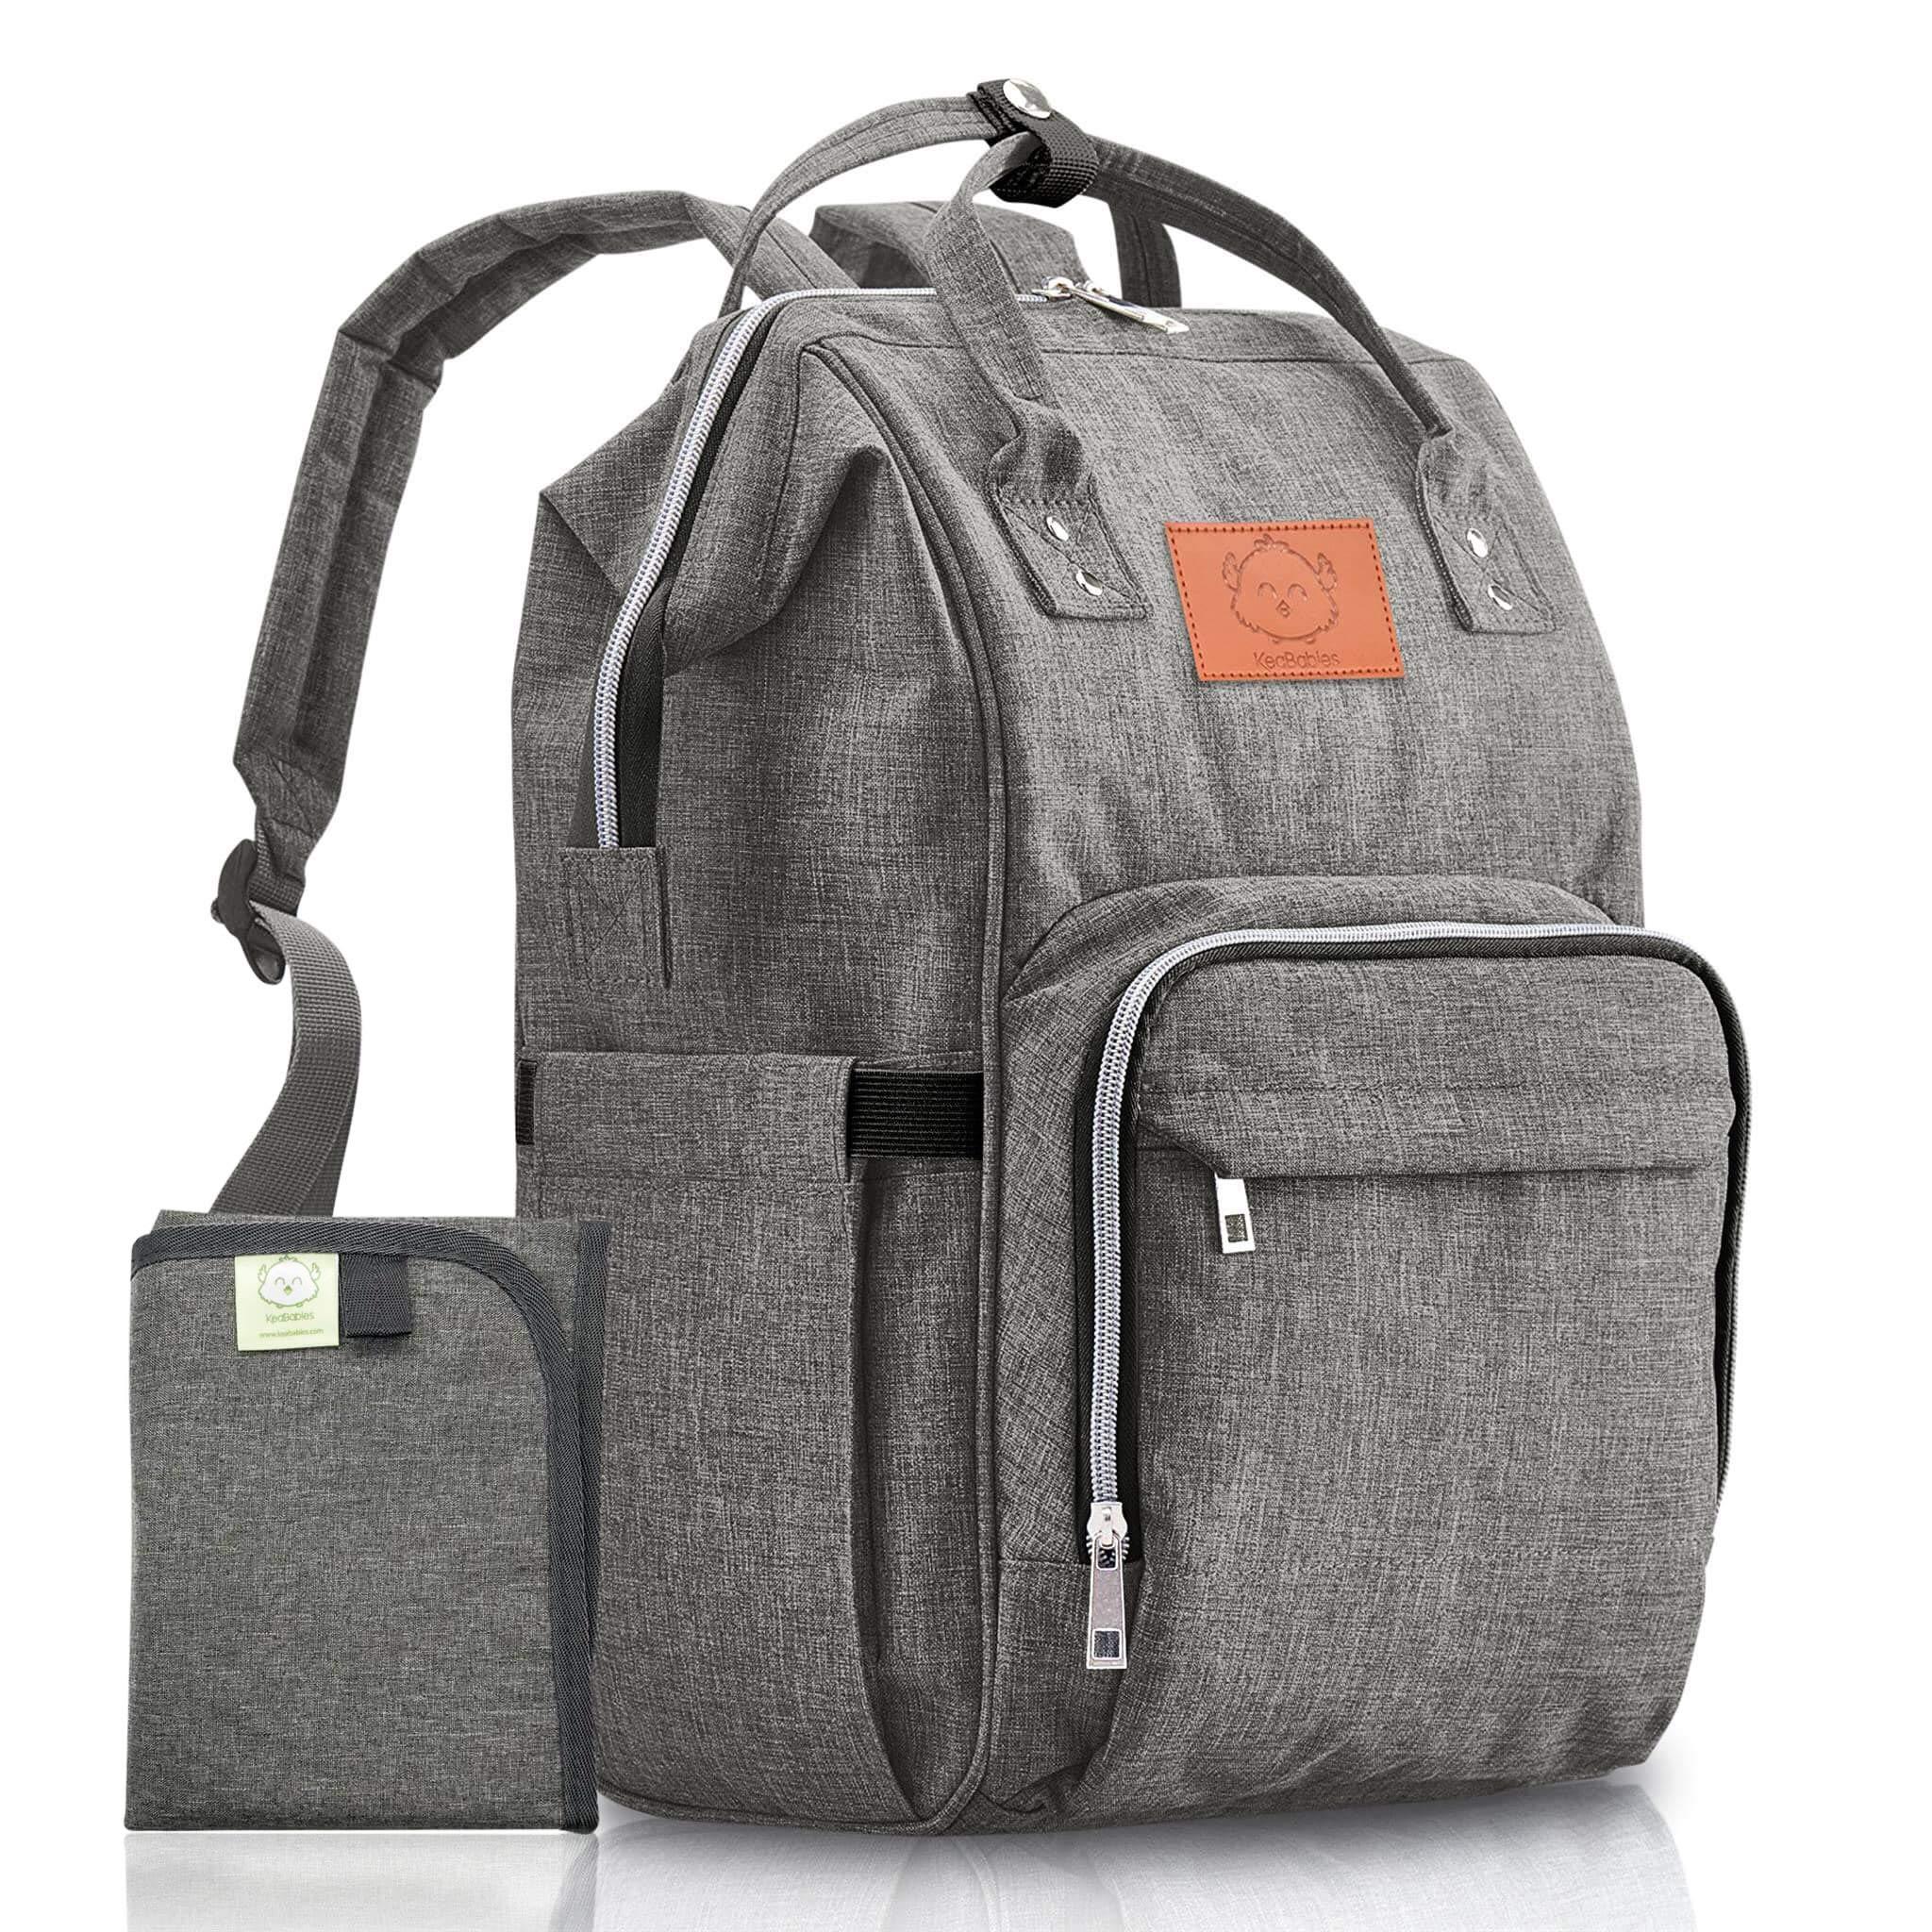 39360b5d2a6 Baby Diaper Bag Backpack - Multi-Function Waterproof Travel Baby ...